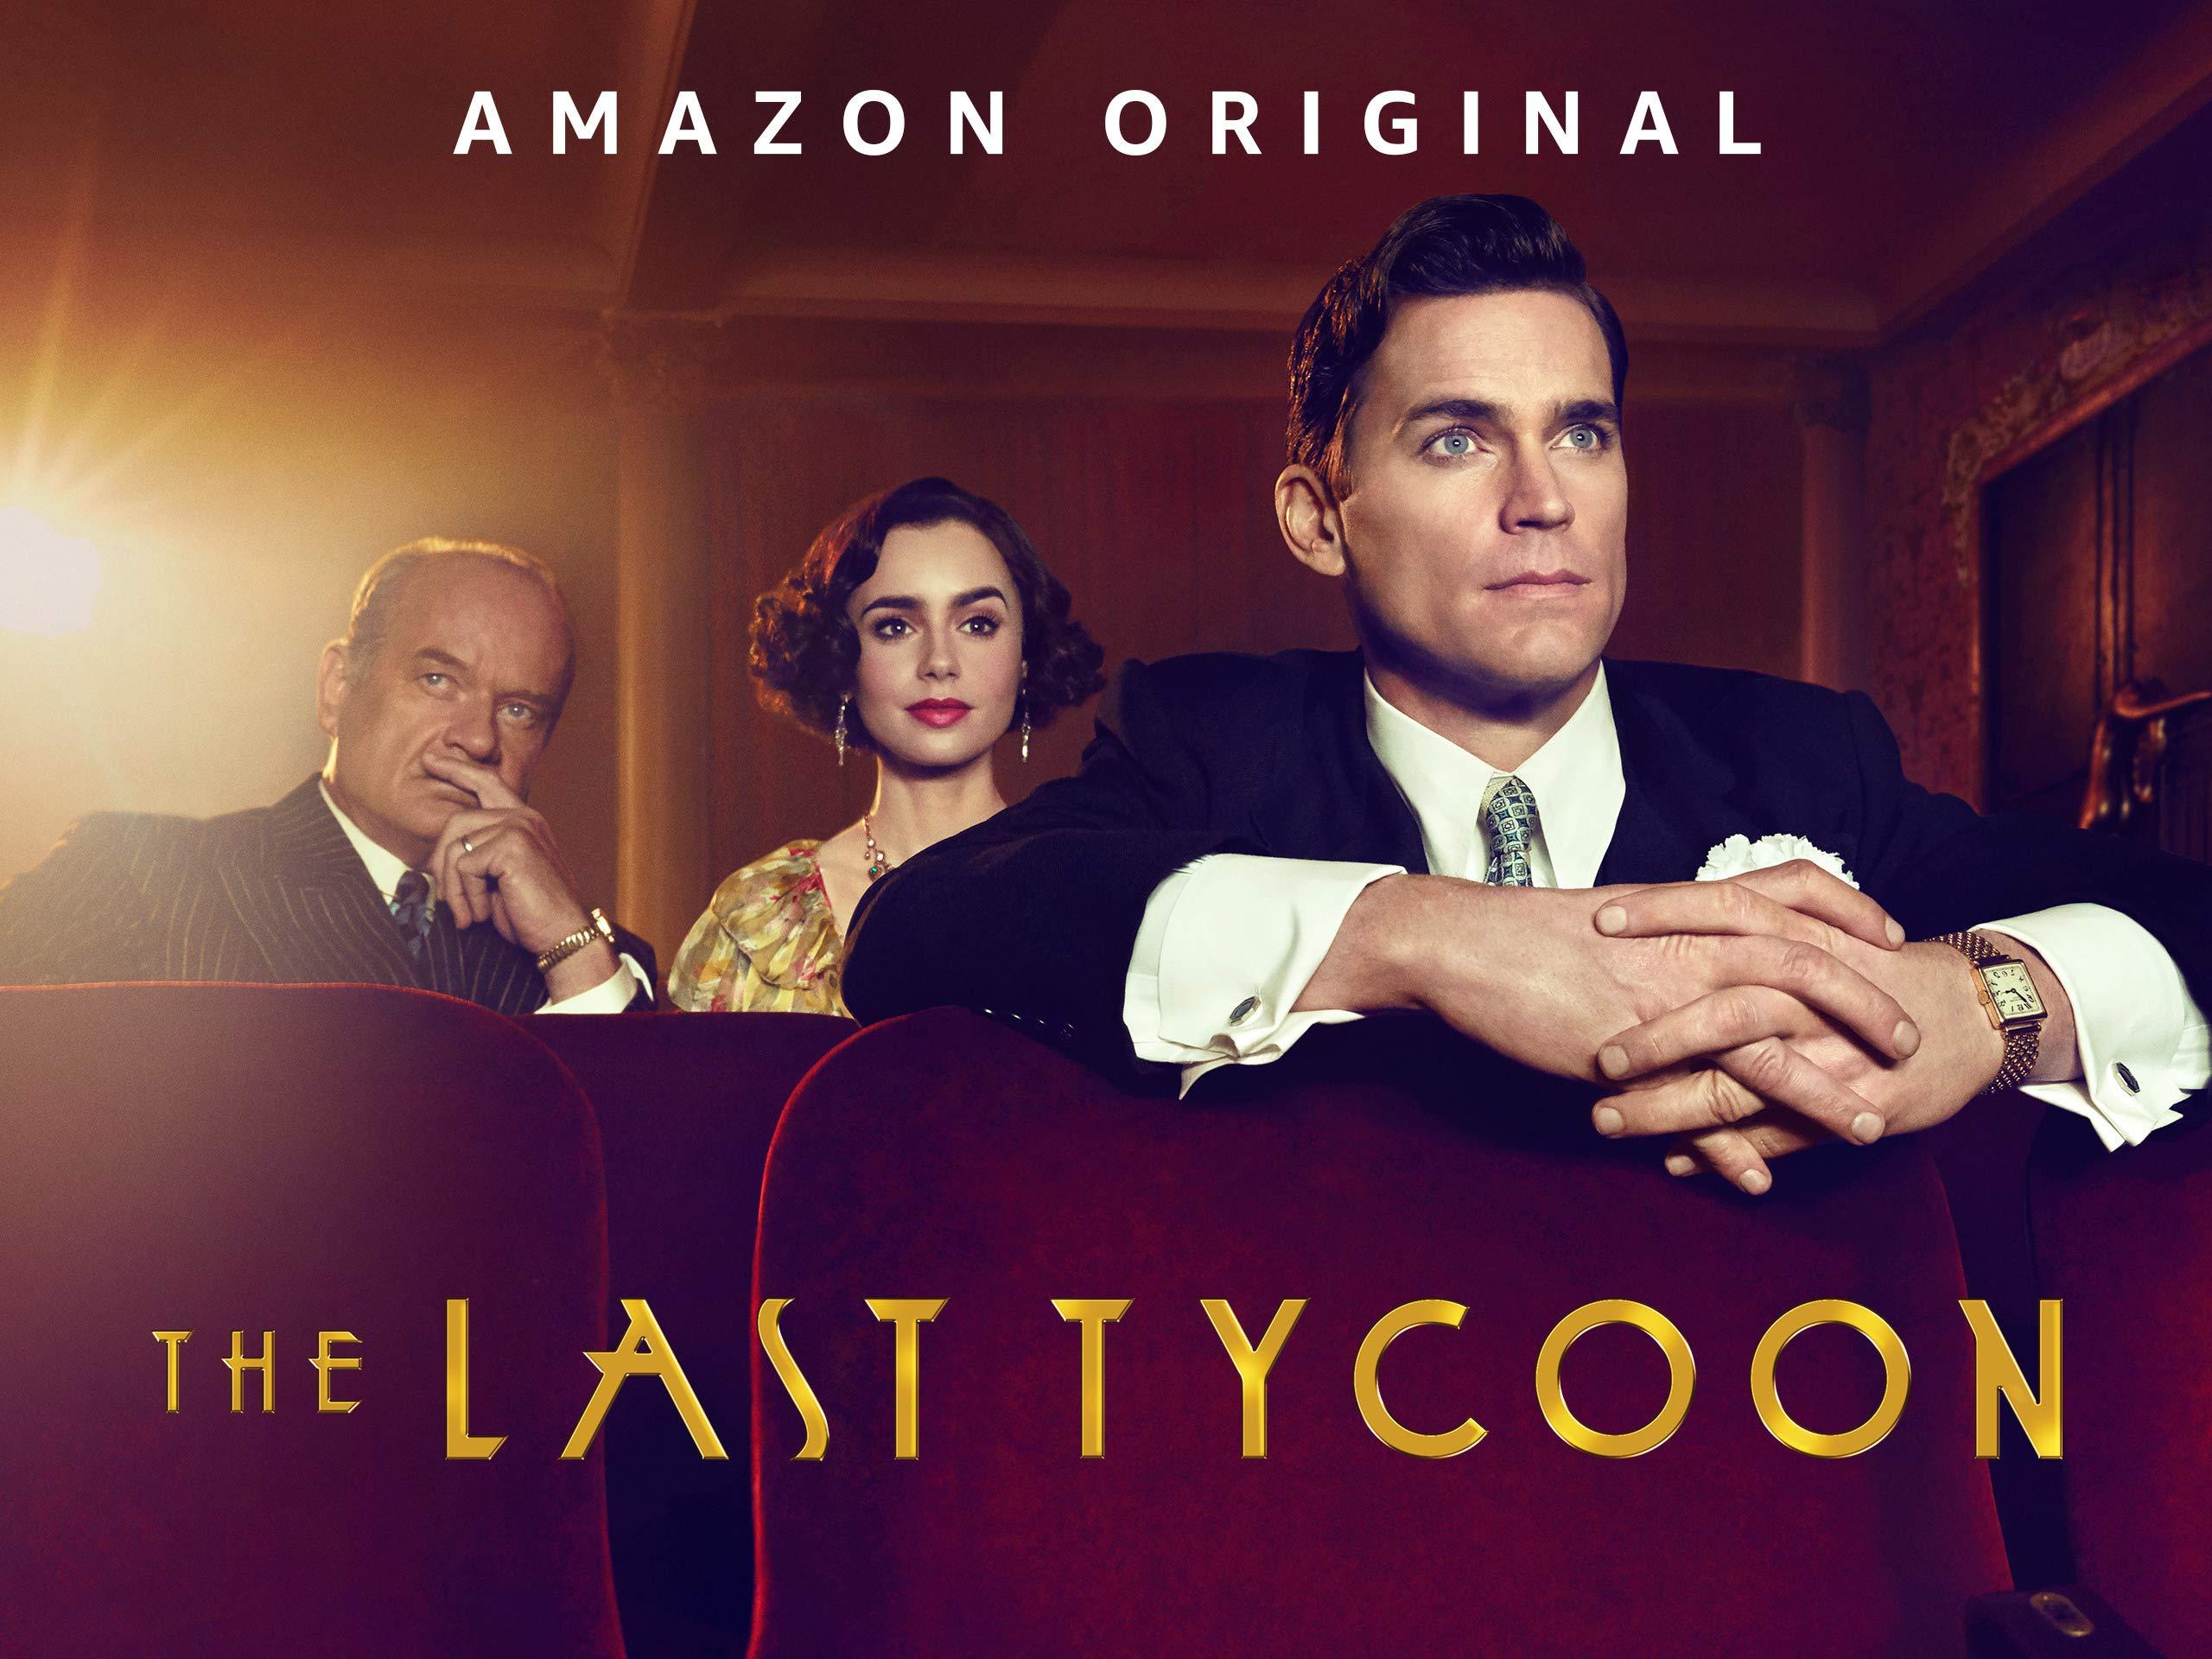 Amazon com: Watch The Last Tycoon - Season 1 | Prime Video